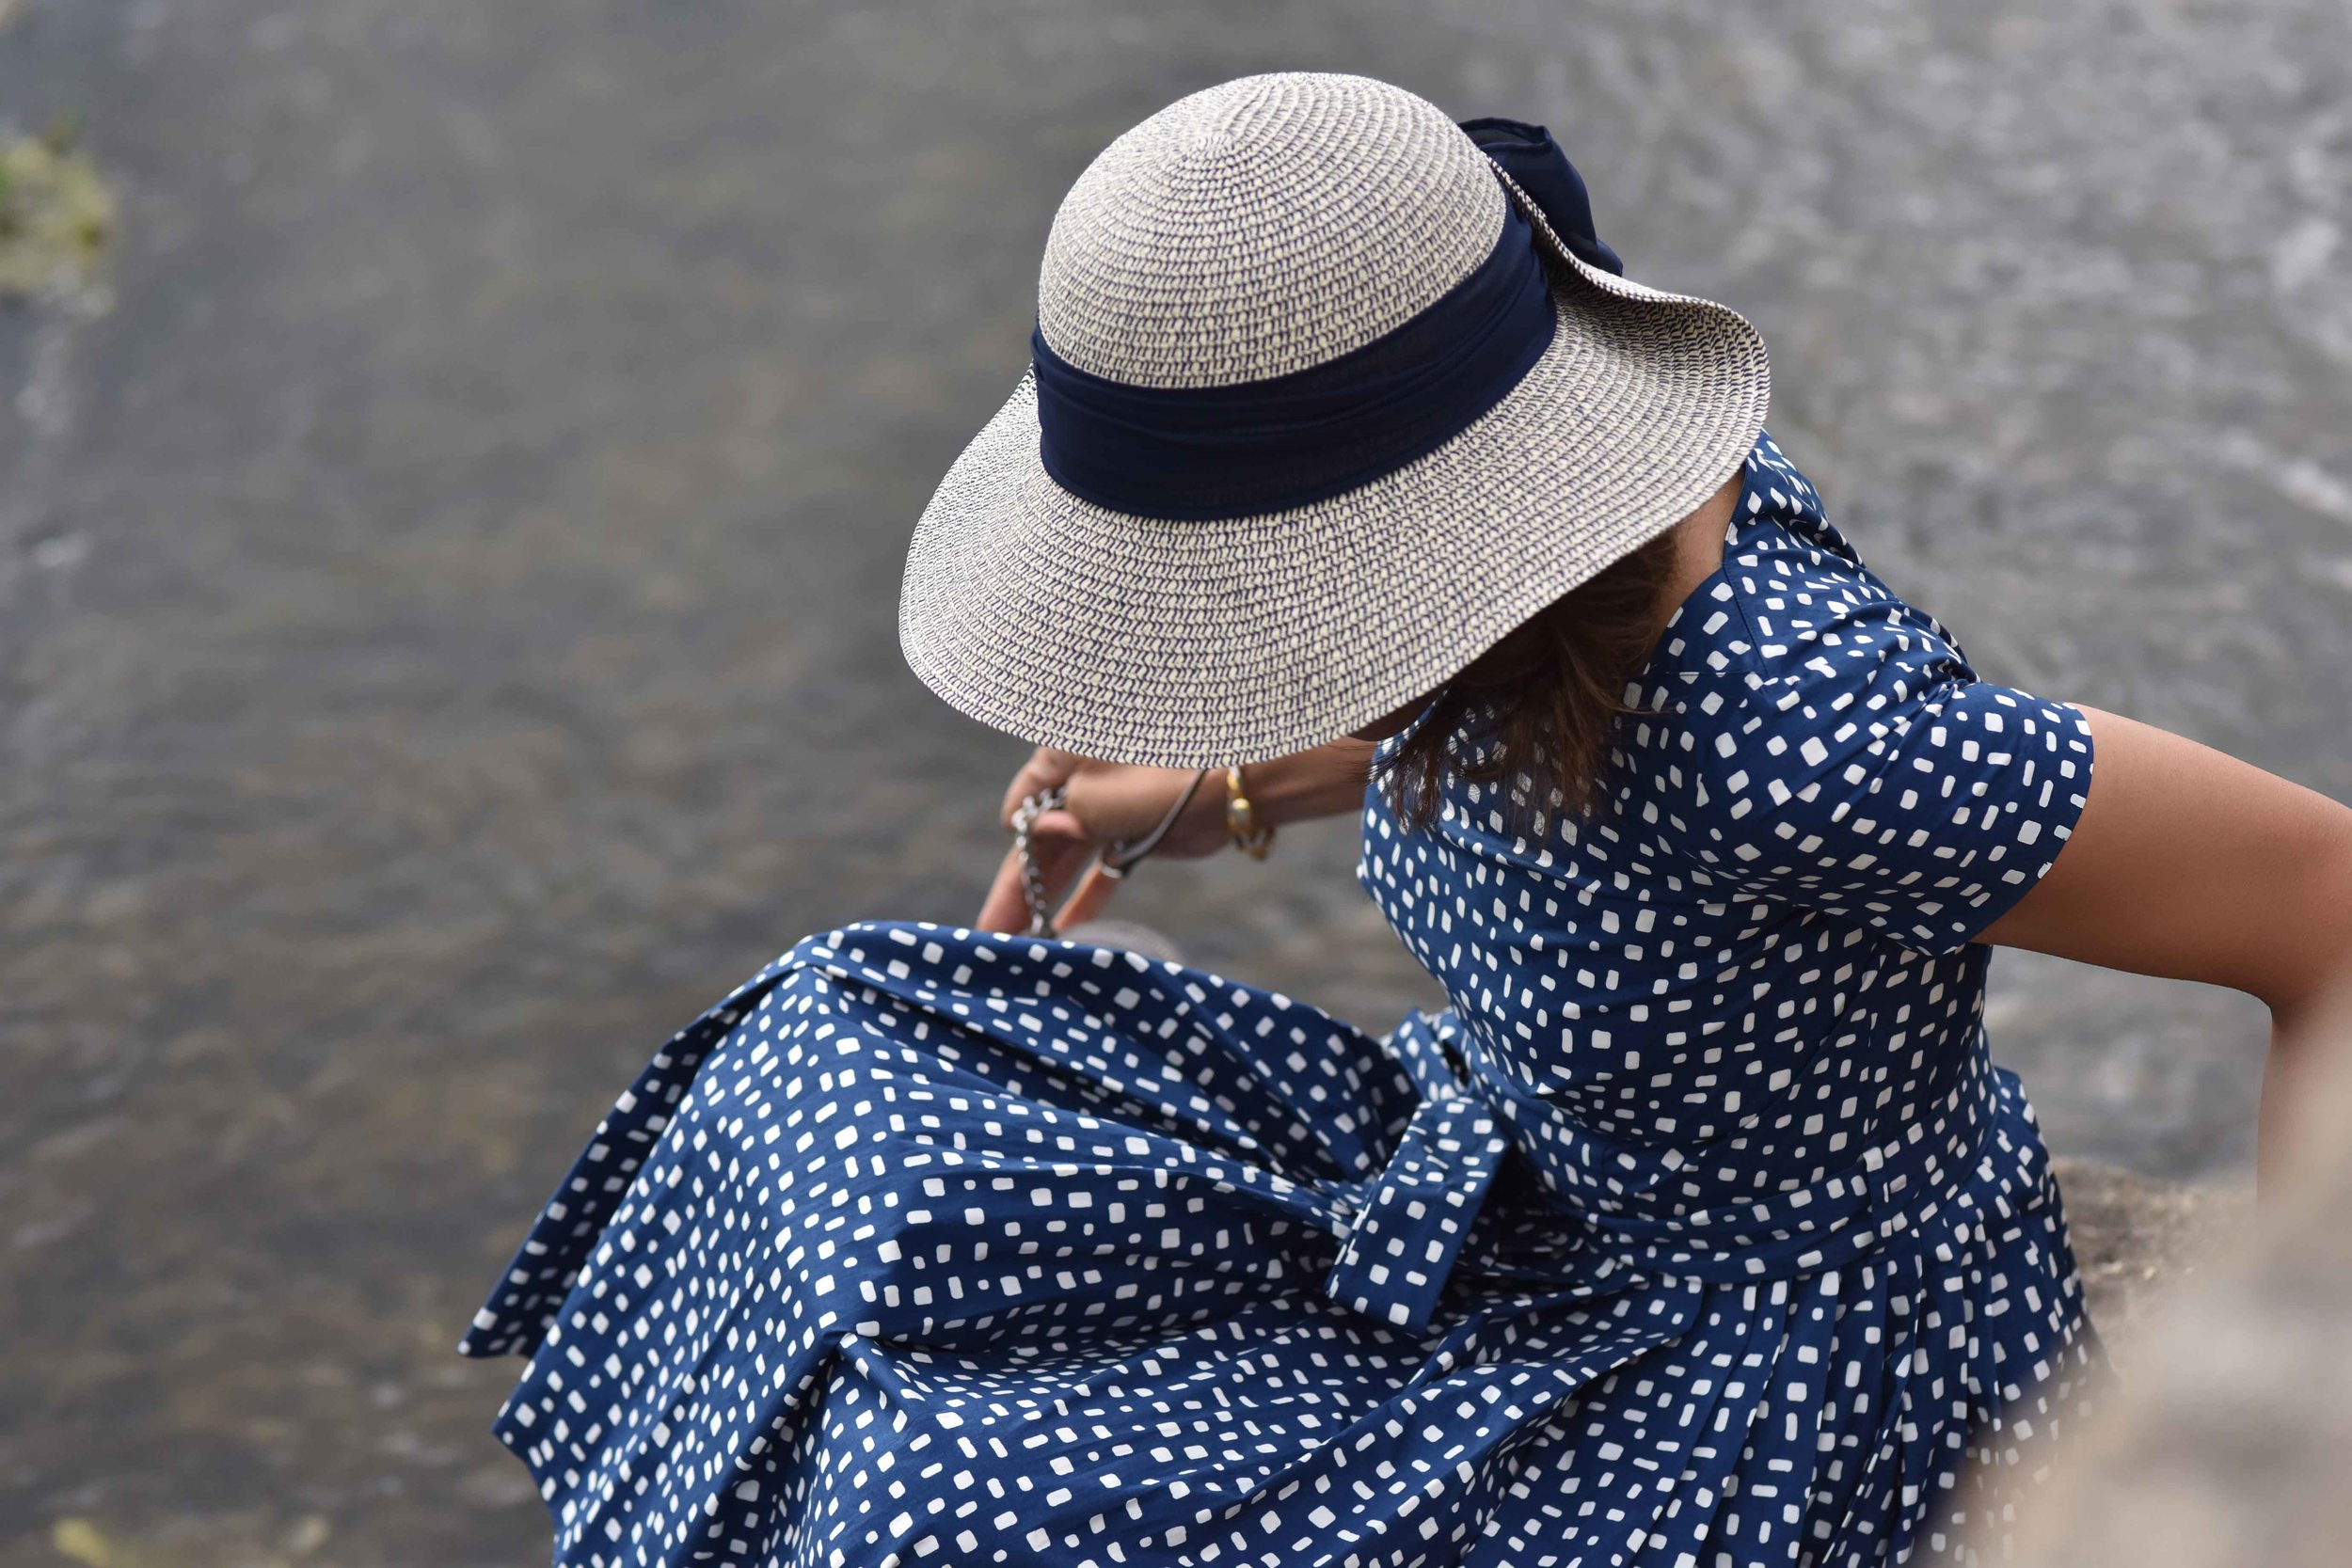 Prada dress, MNS hat, River Coln, Bibury, Cotswold, England. Image©sourcingstyle.com